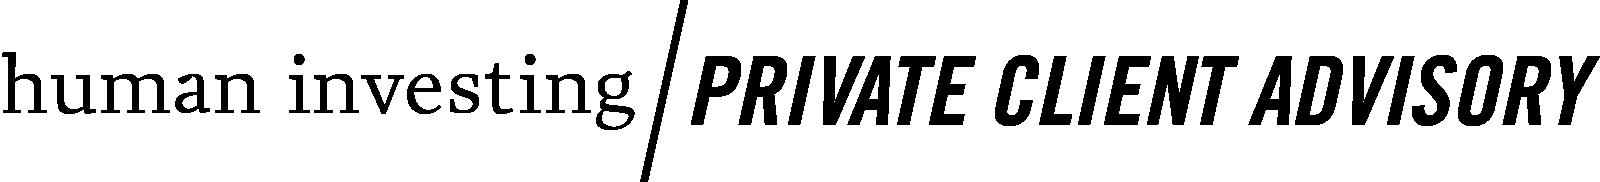 hi-private-client.png